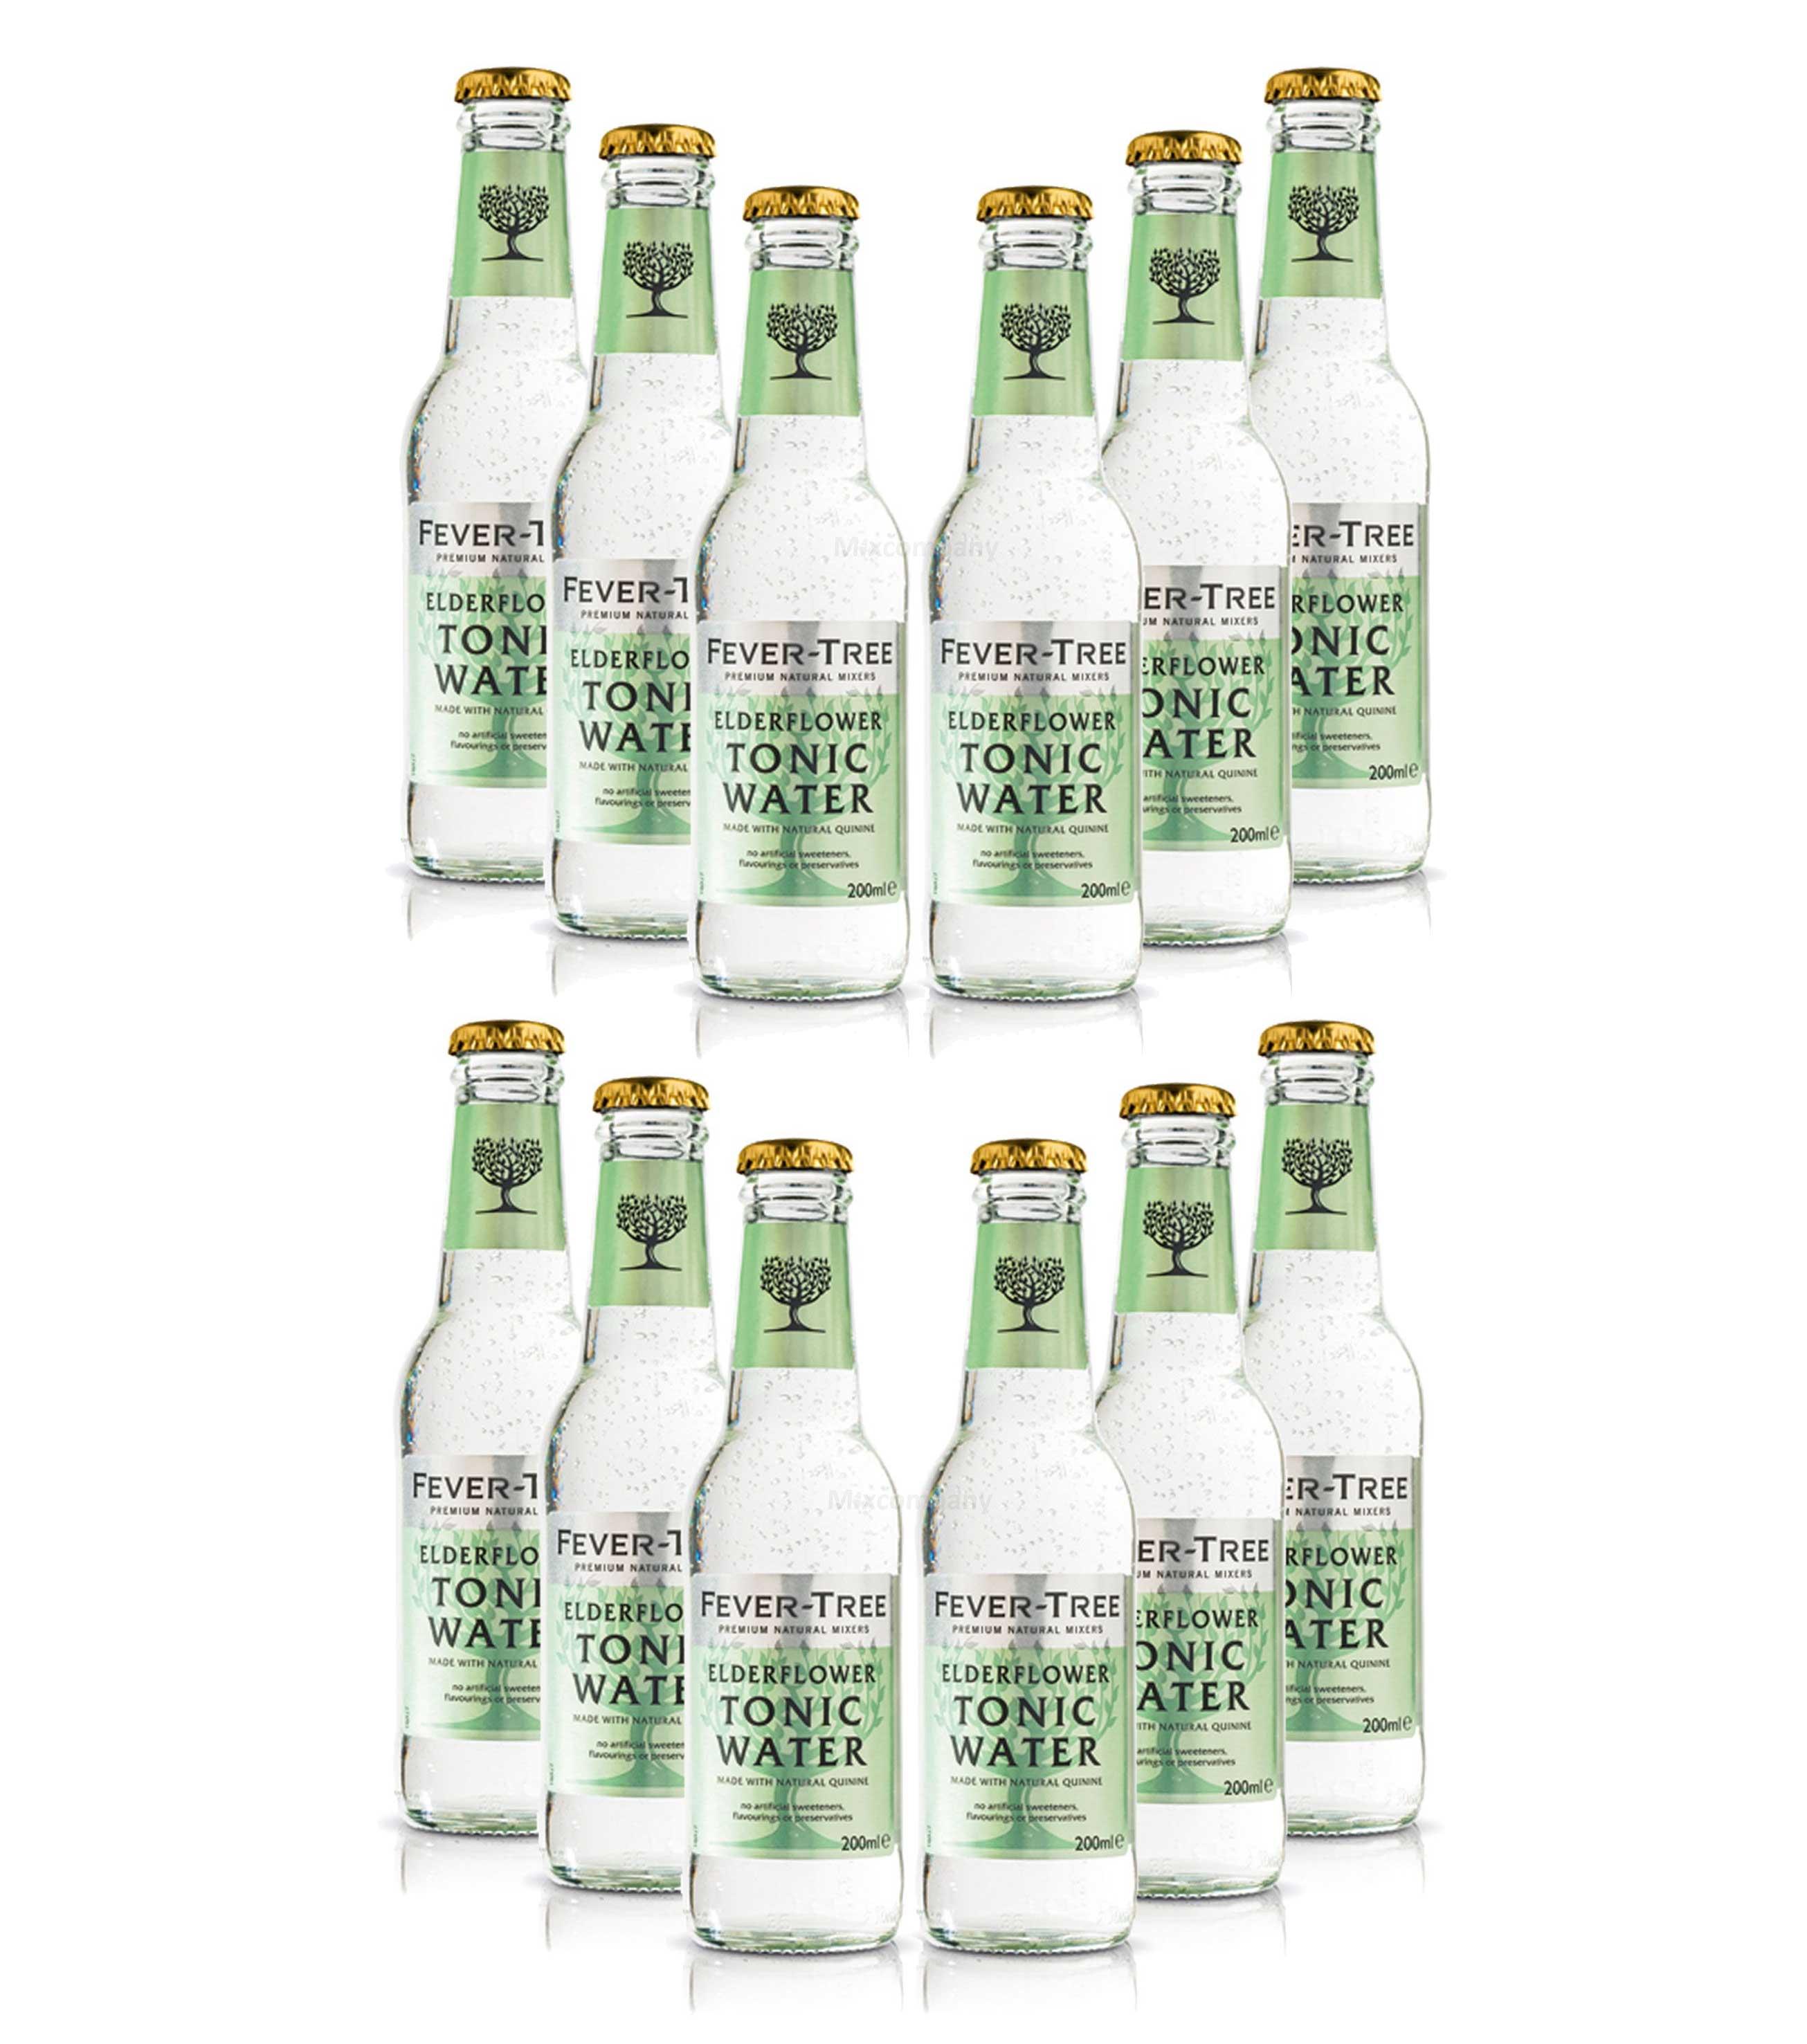 Fever Tree Elderflower Tonic Water Set - 12x 200ml inkl. Pfand MEHRWEG